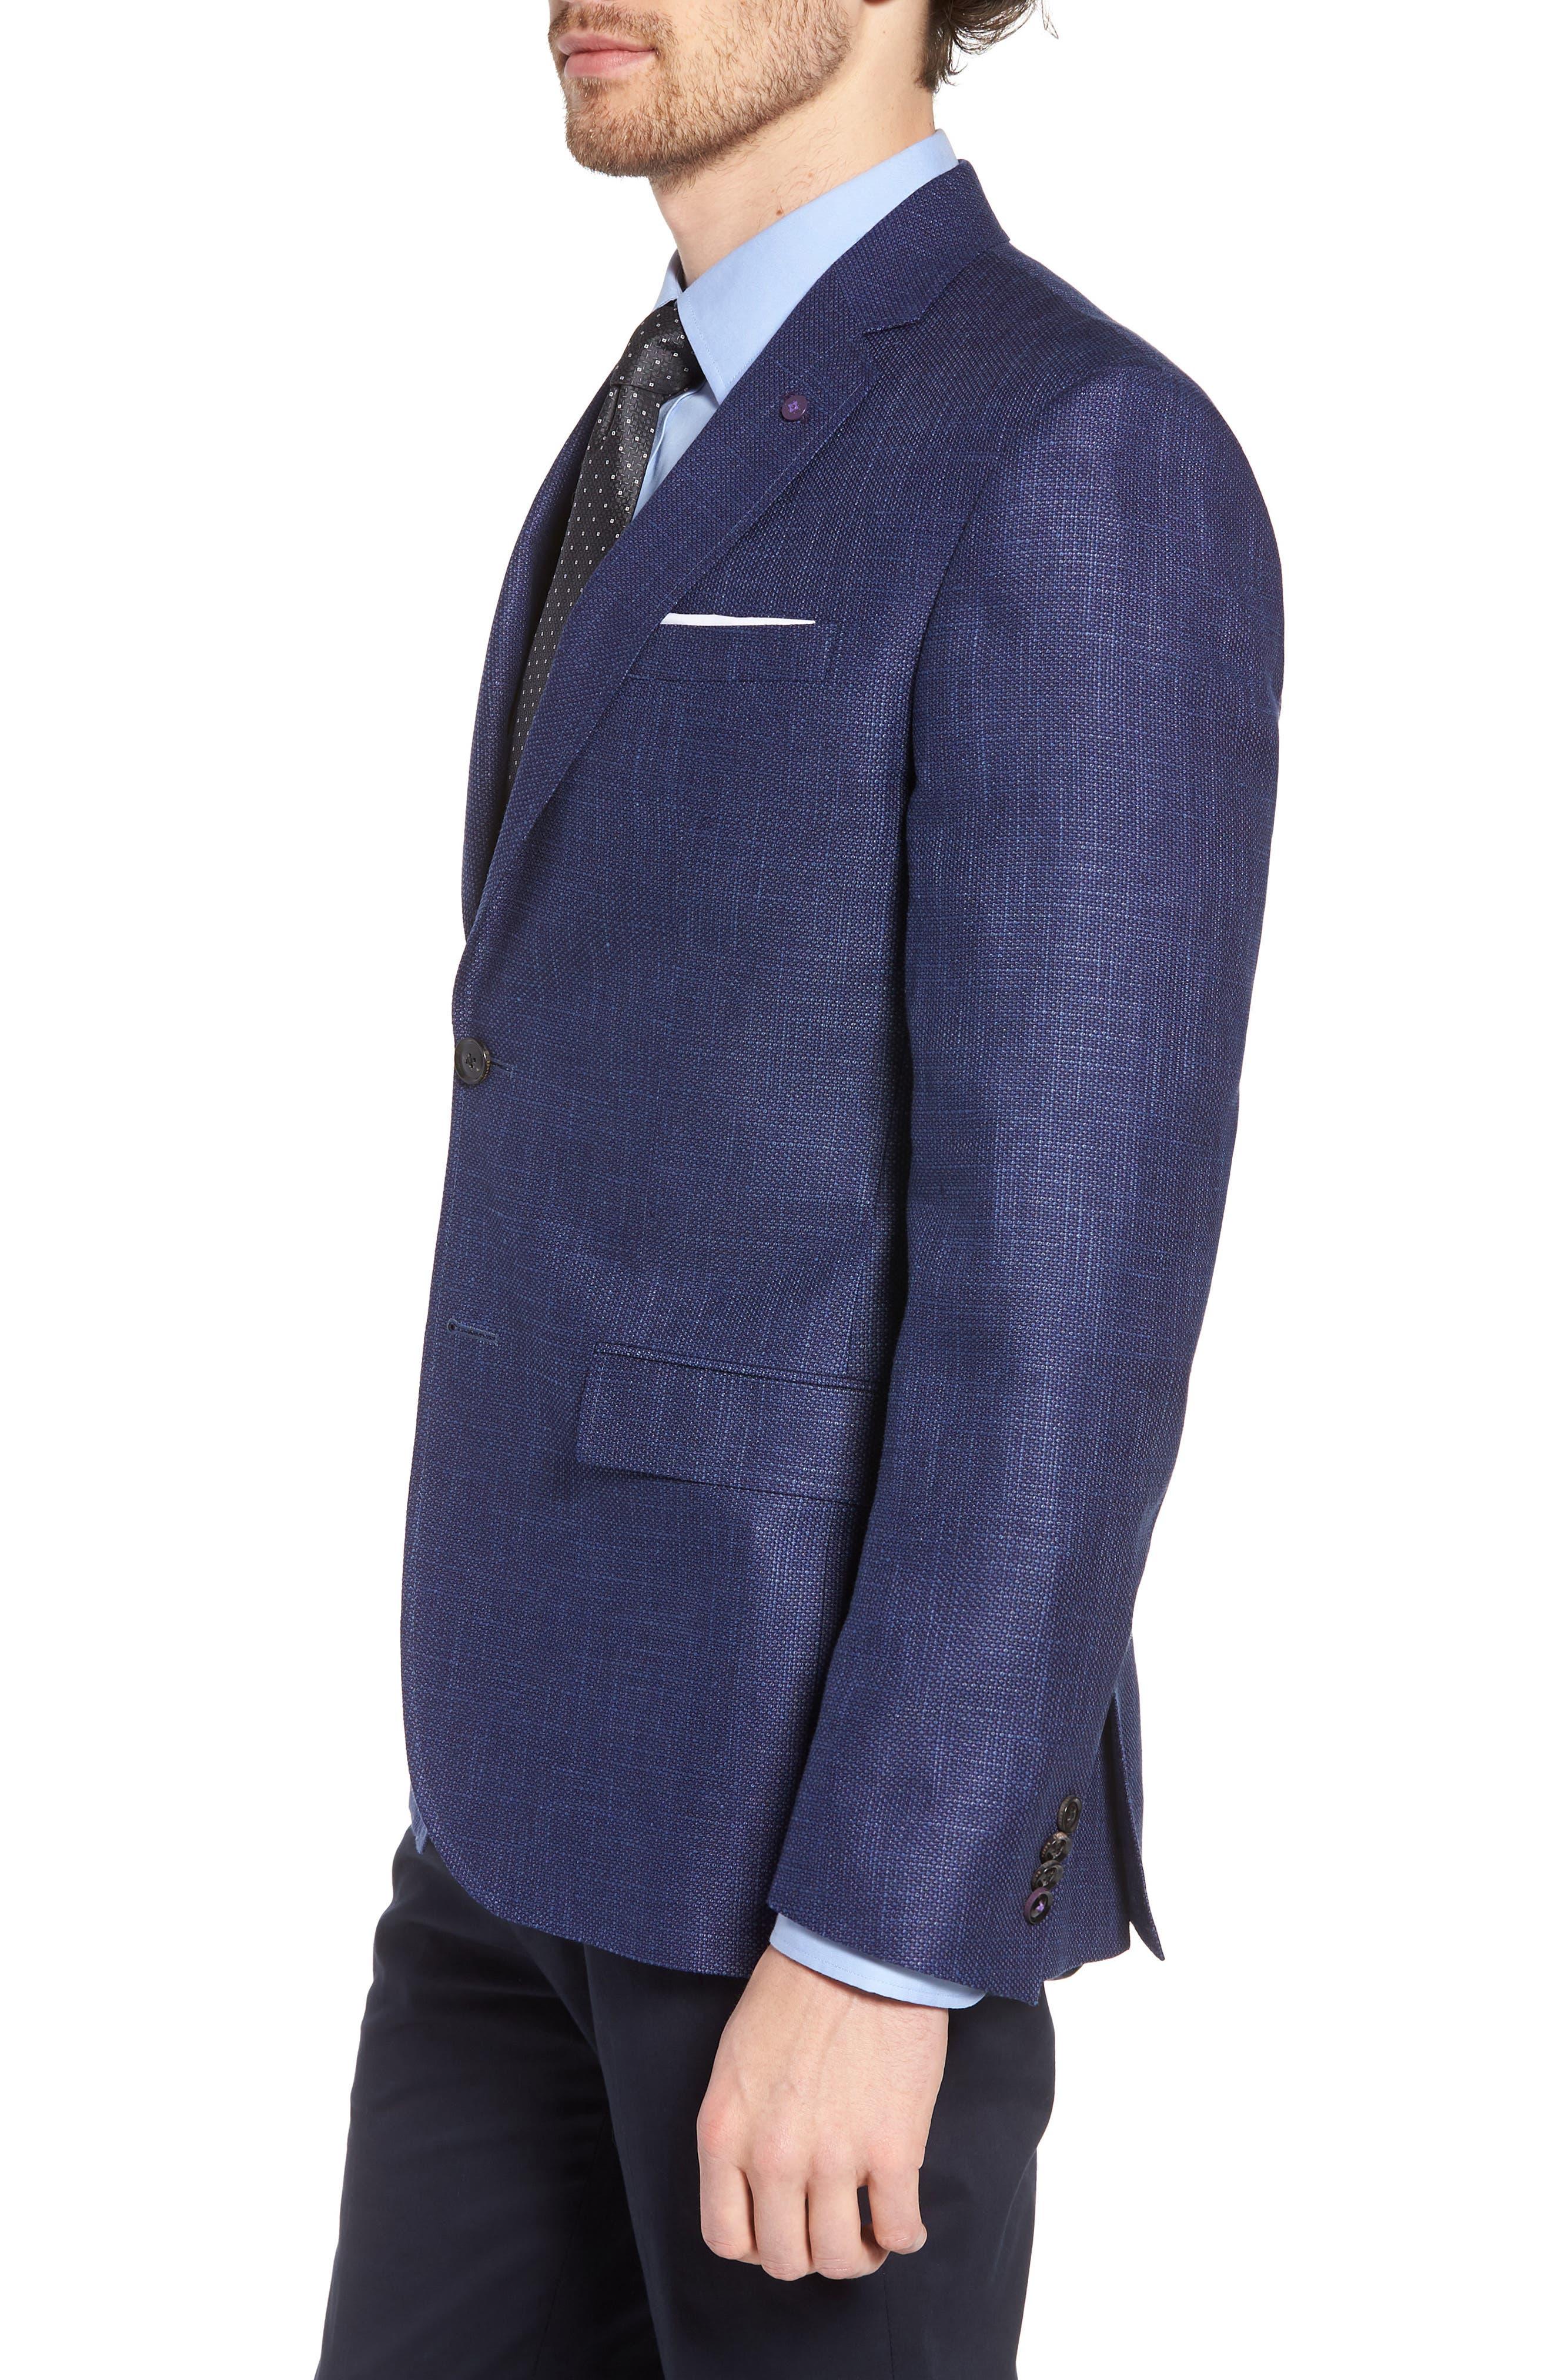 Jay Trim Fit Linen & Wool Blazer,                             Alternate thumbnail 3, color,                             Blue